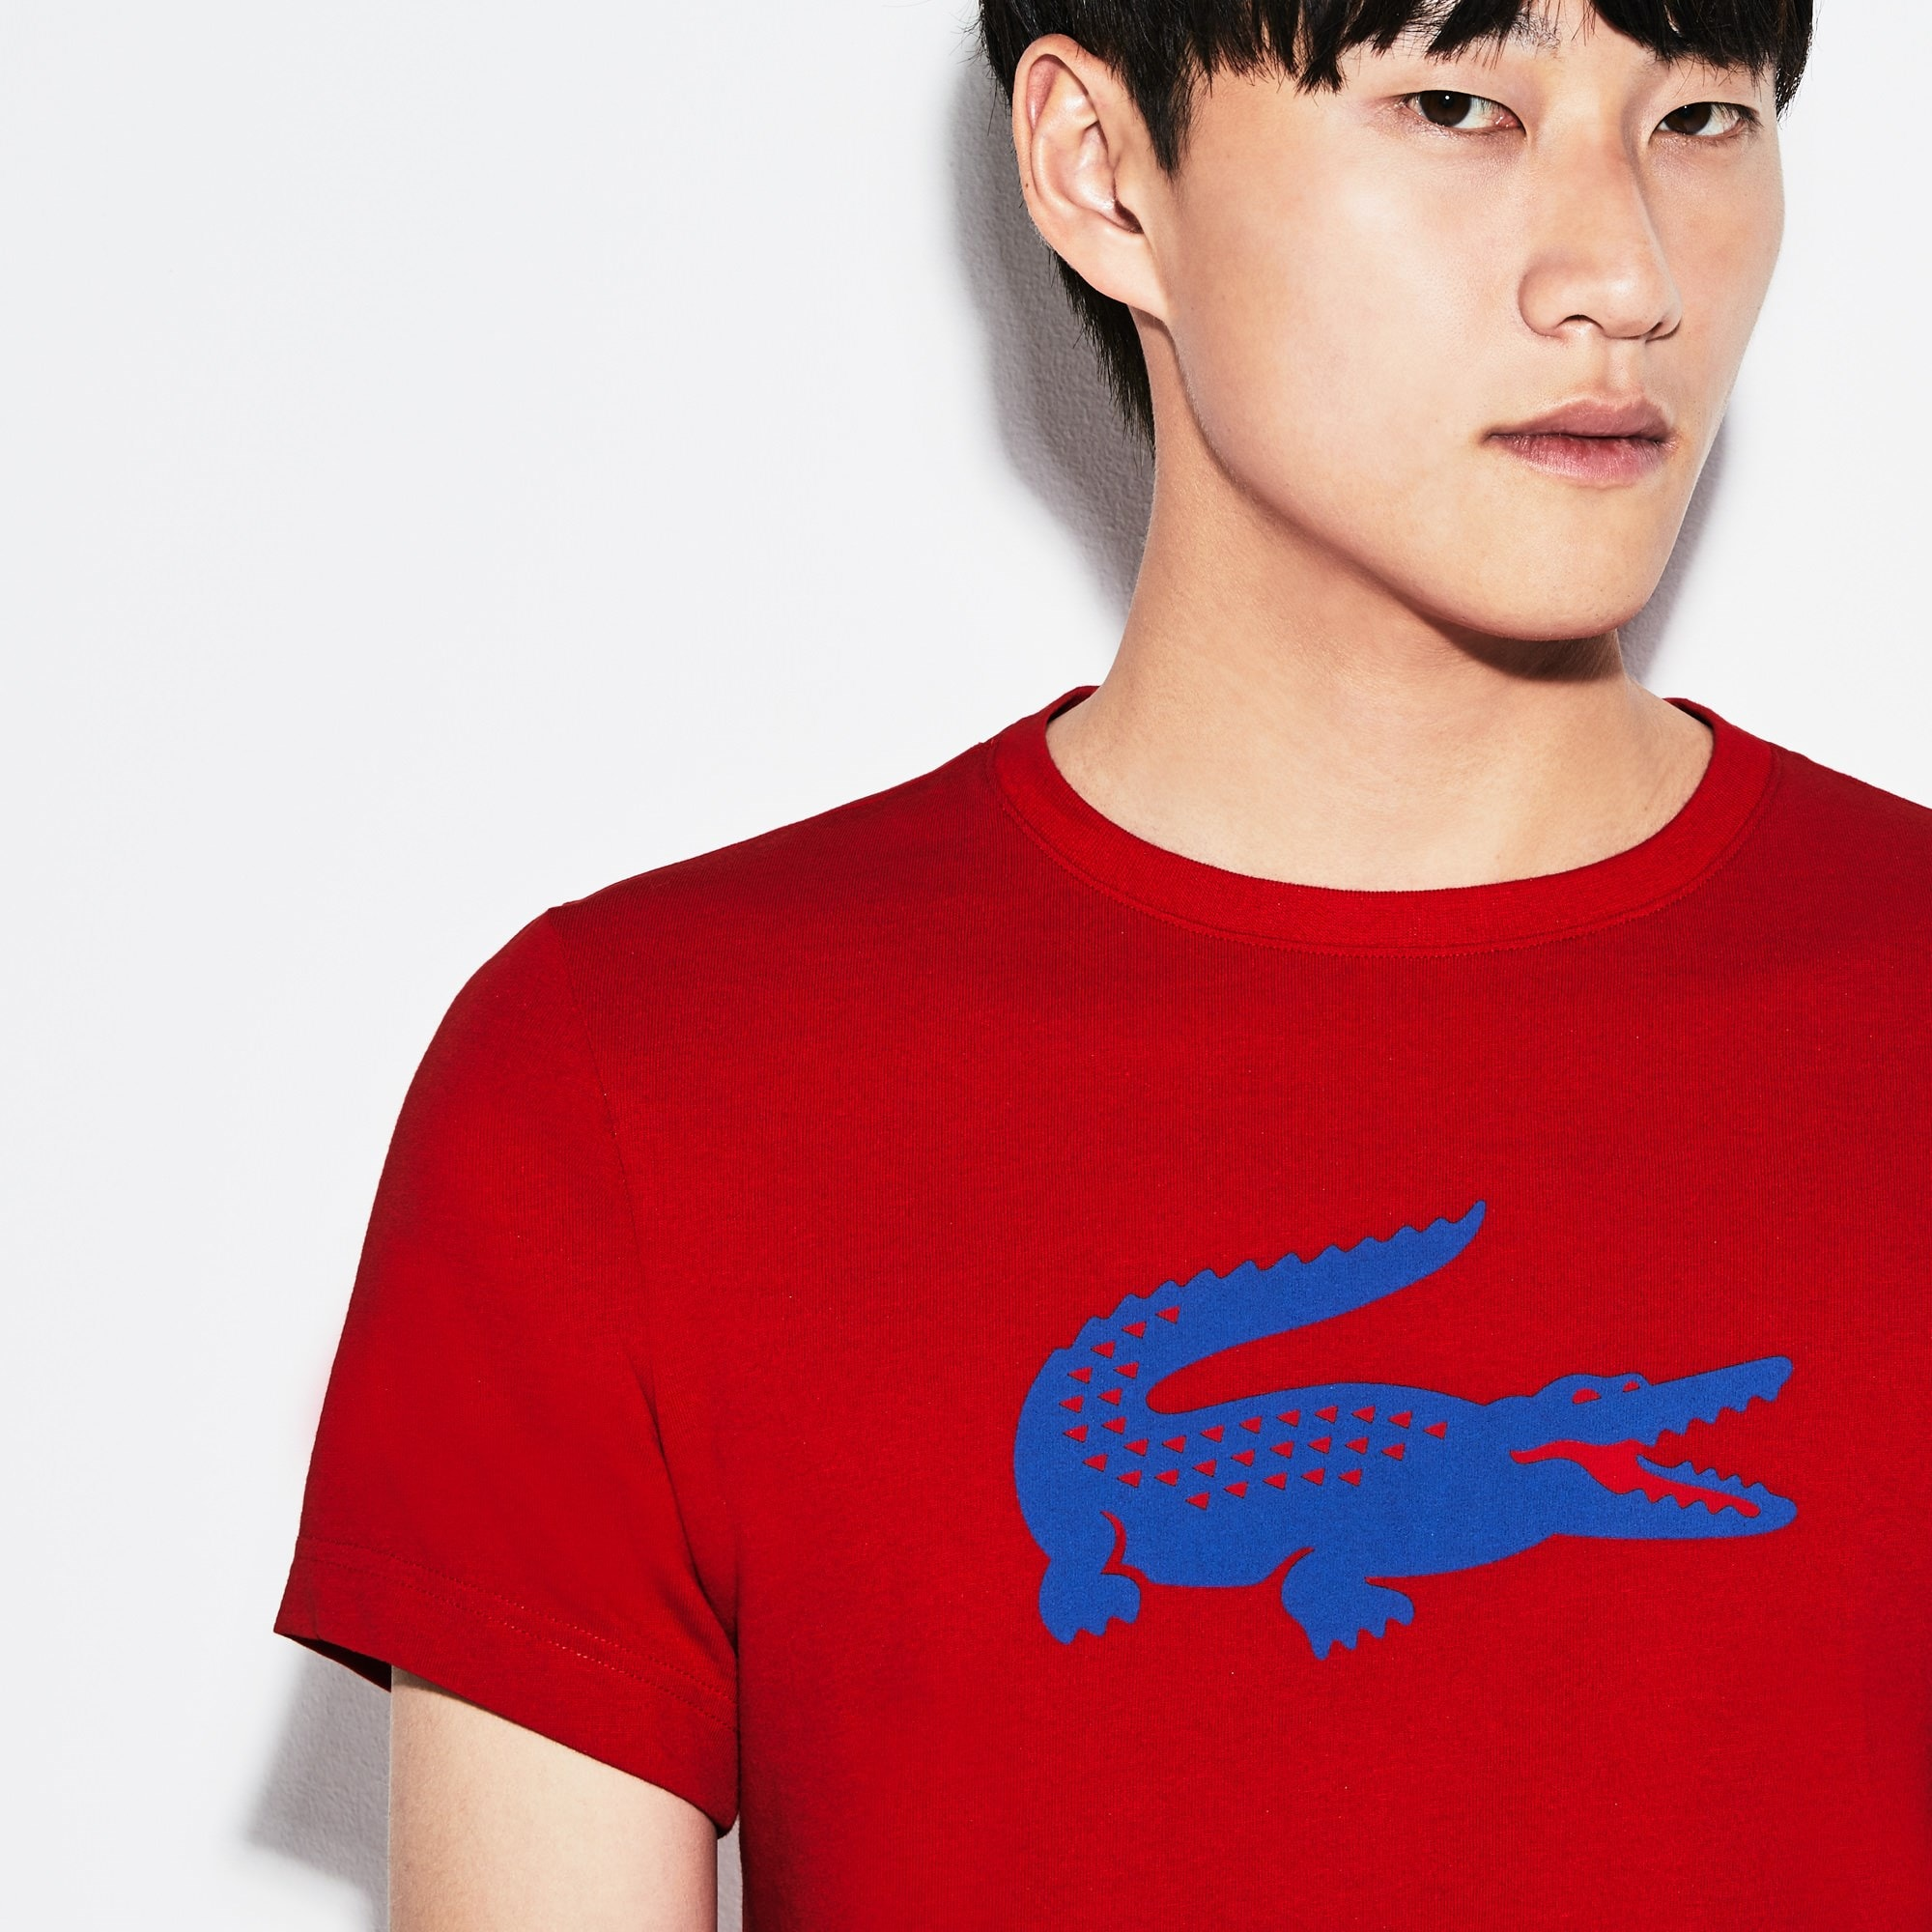 Lacoste SPORT tennisshirt van technisch jersey met oversized krokodil